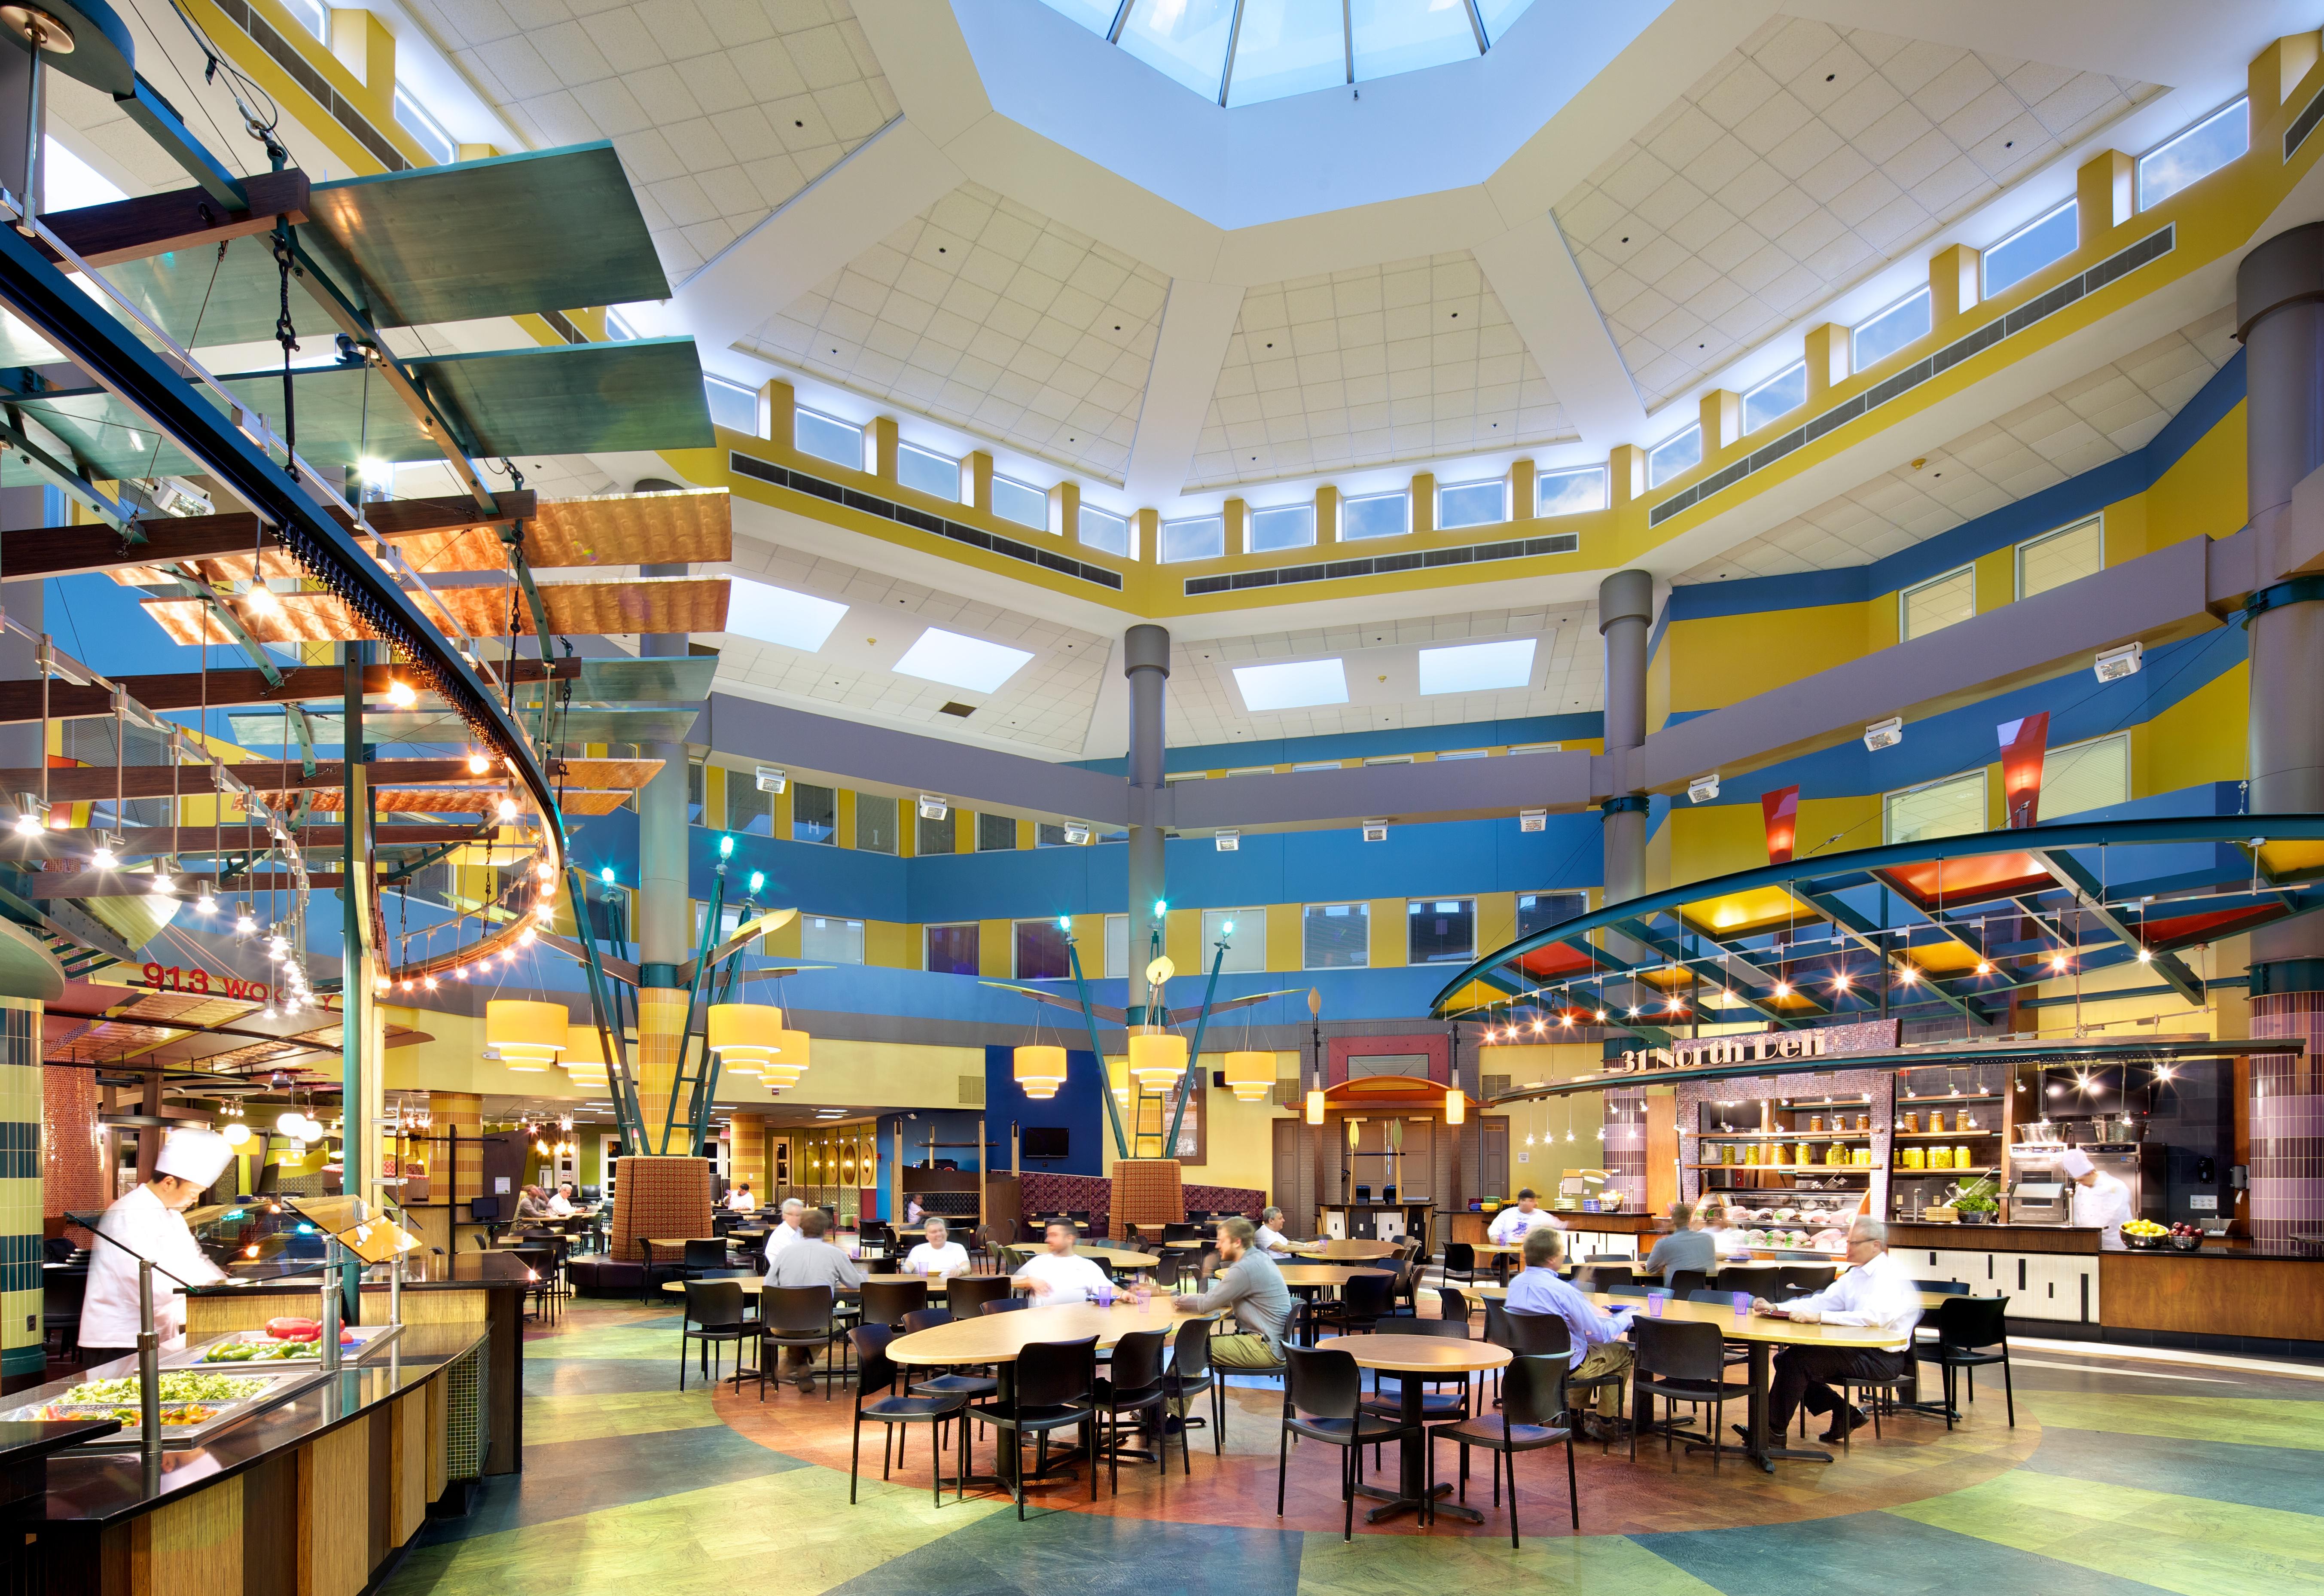 Commercial Kitchen Design Binghamton Ny